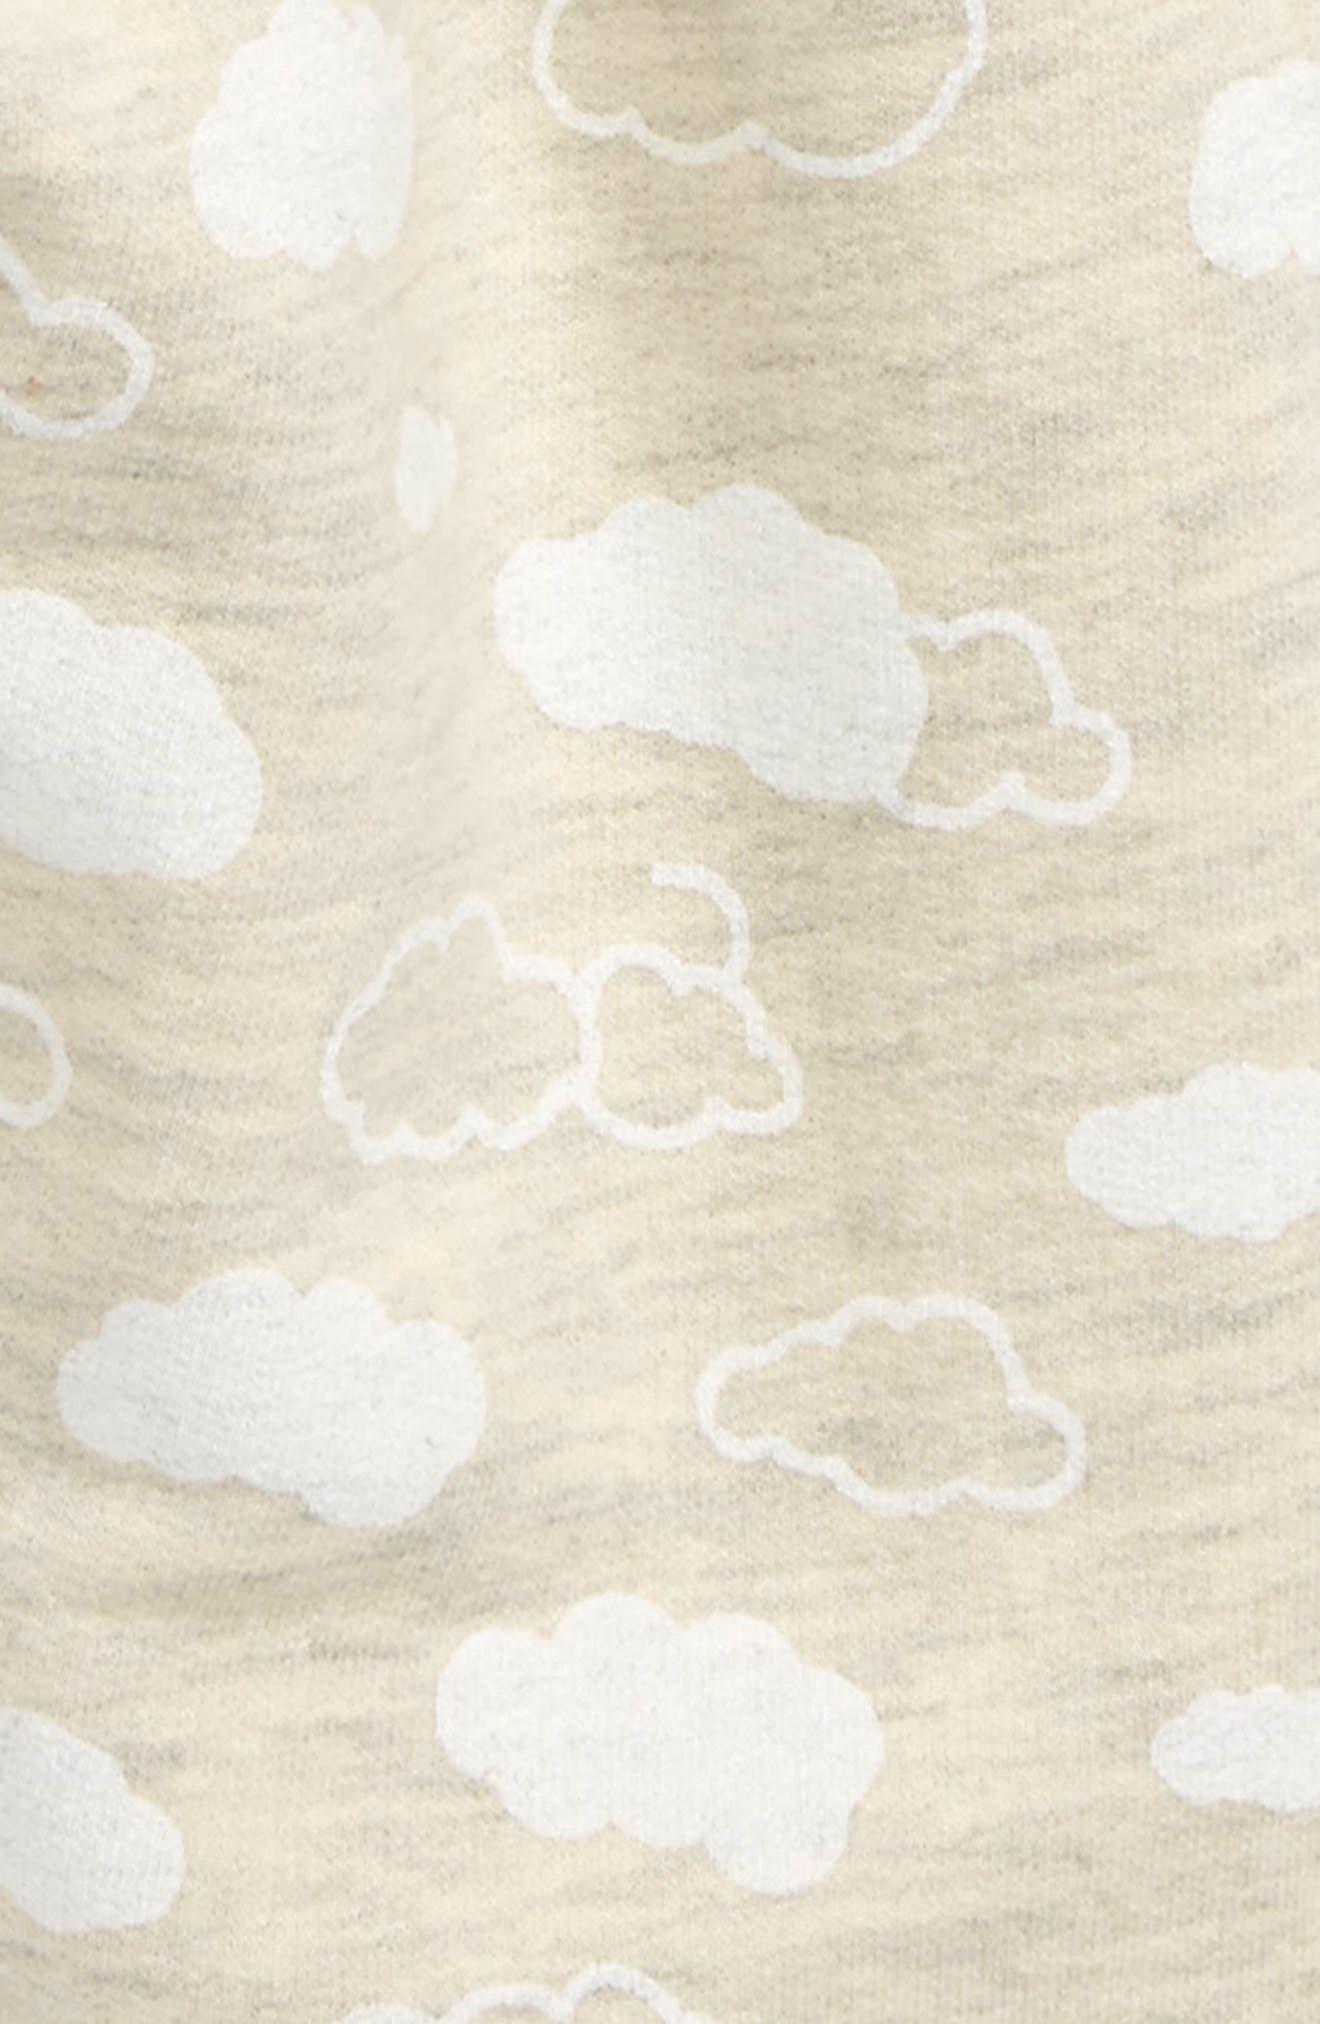 Peek Cloud Sweatpants,                             Alternate thumbnail 2, color,                             272